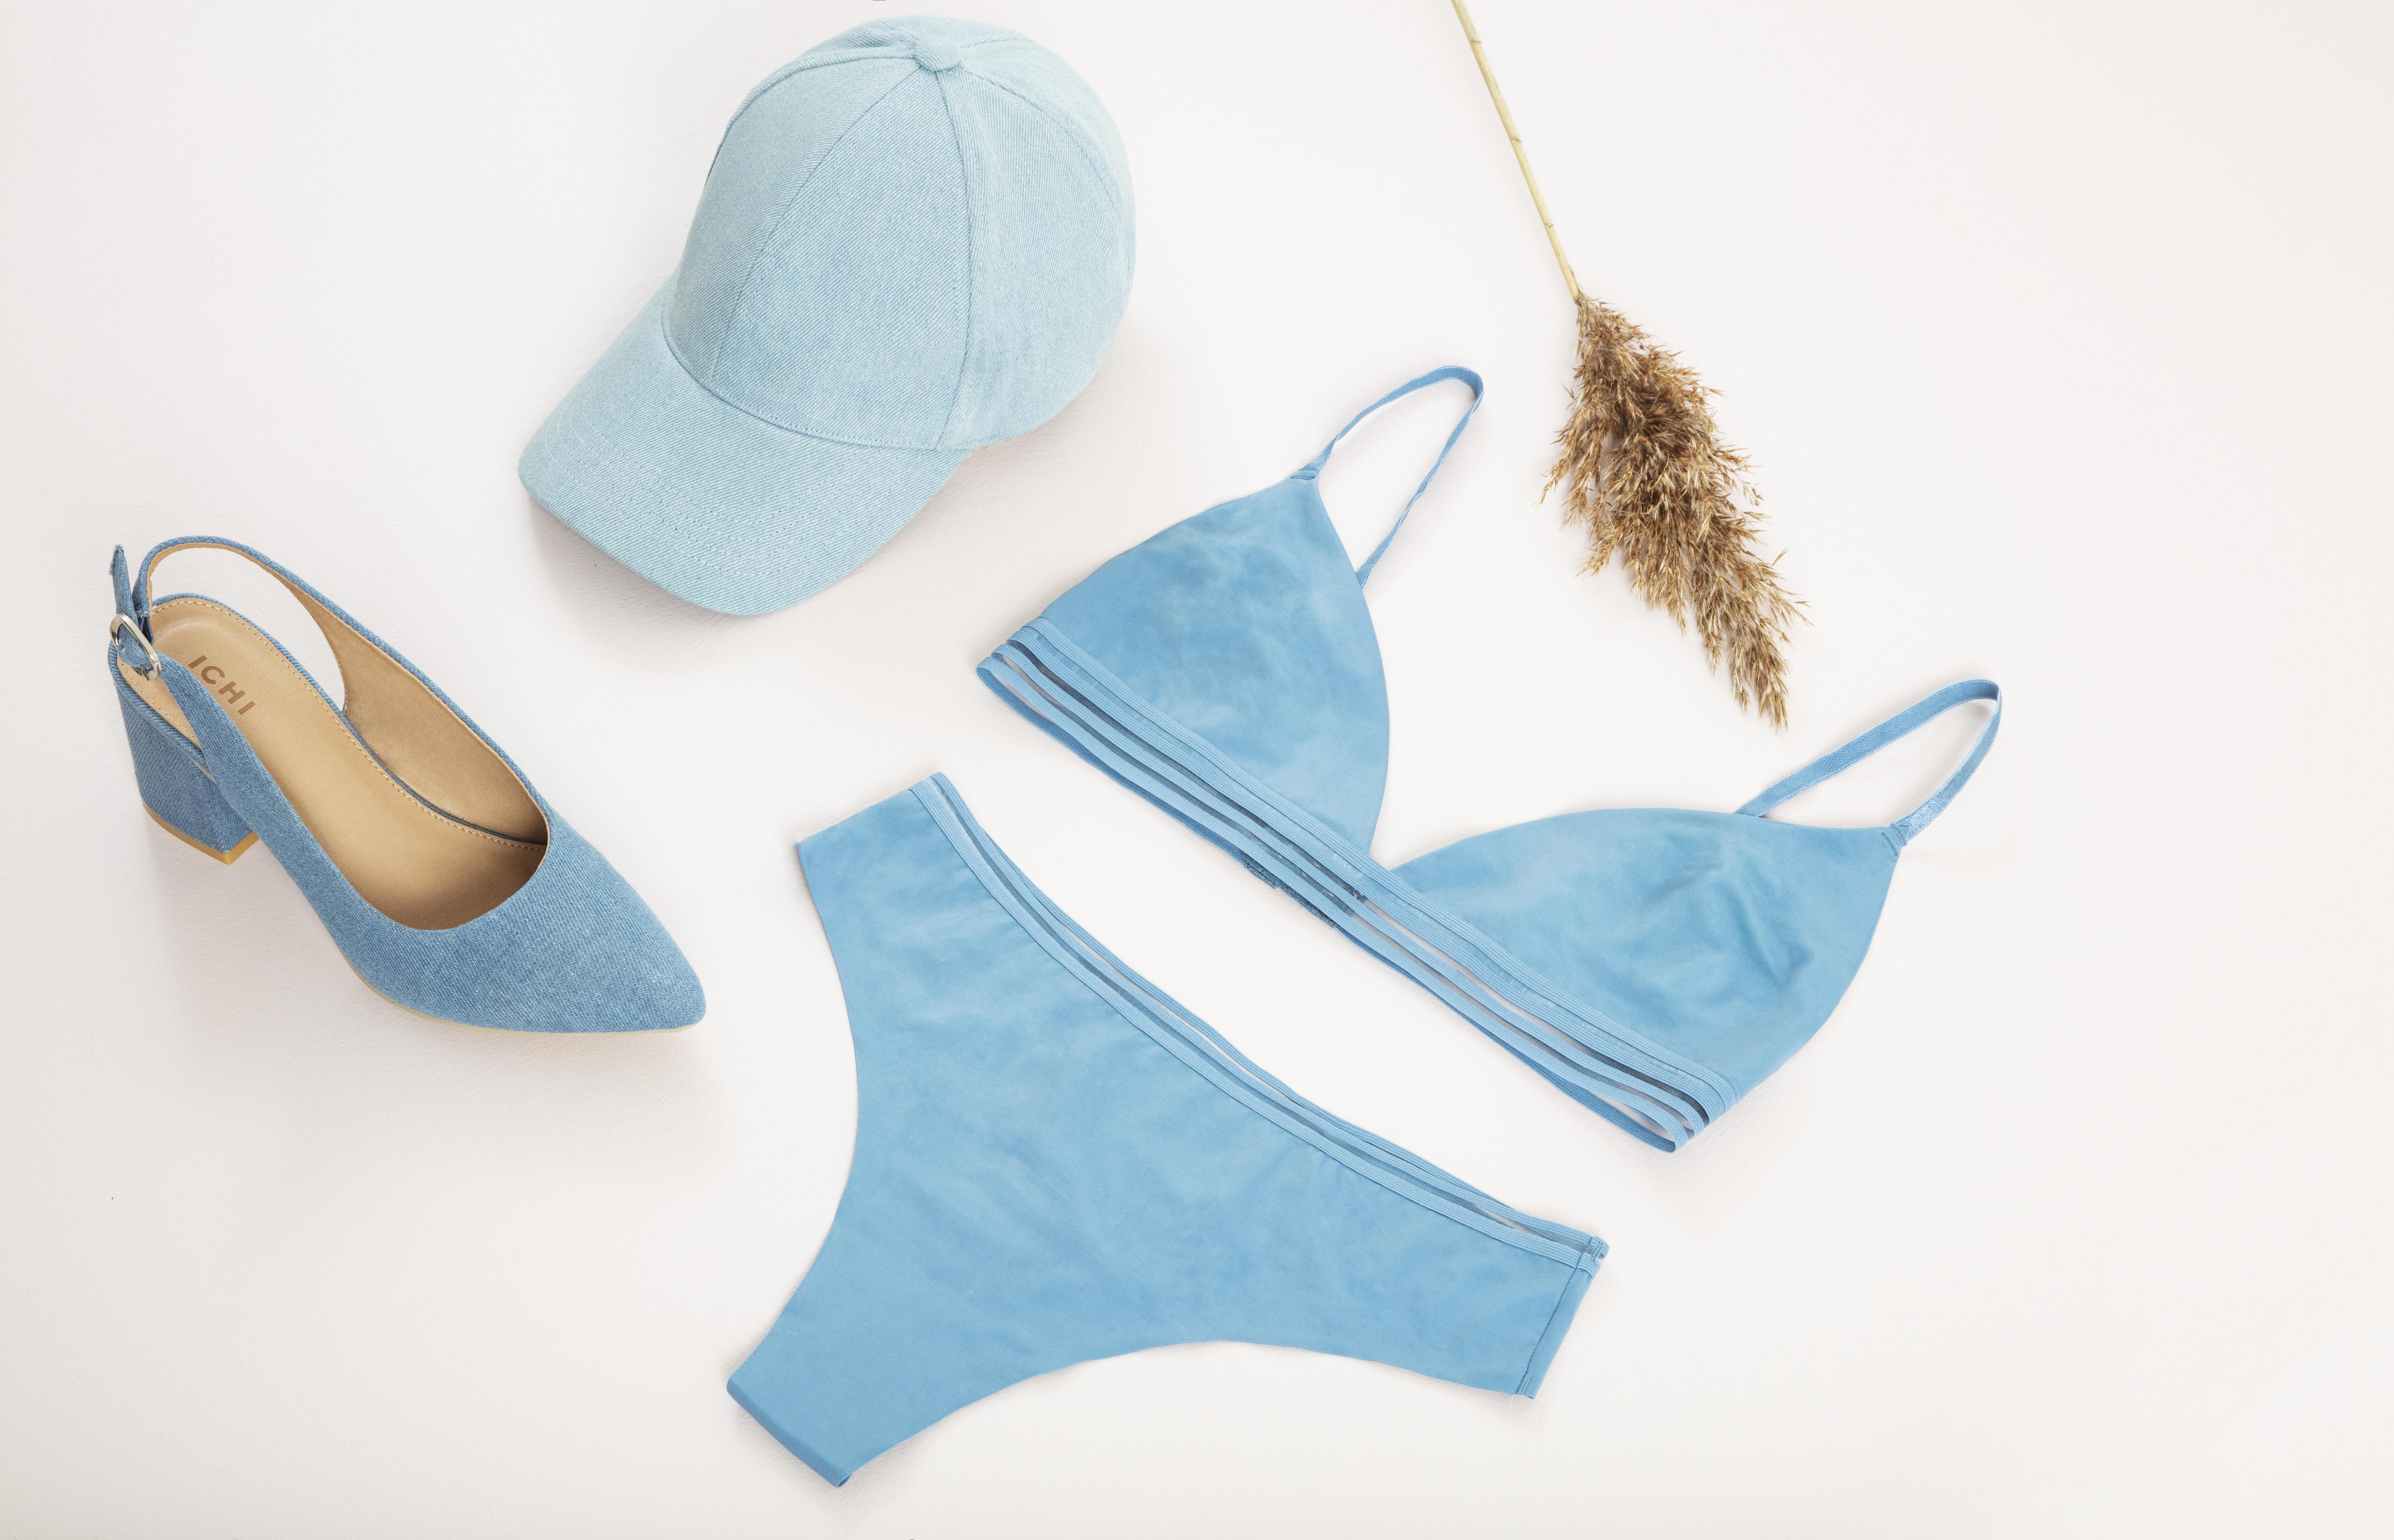 Blue Shadow Undertøj – Køb Blue Shadow Undertøj fra str. XS/S-M/L her